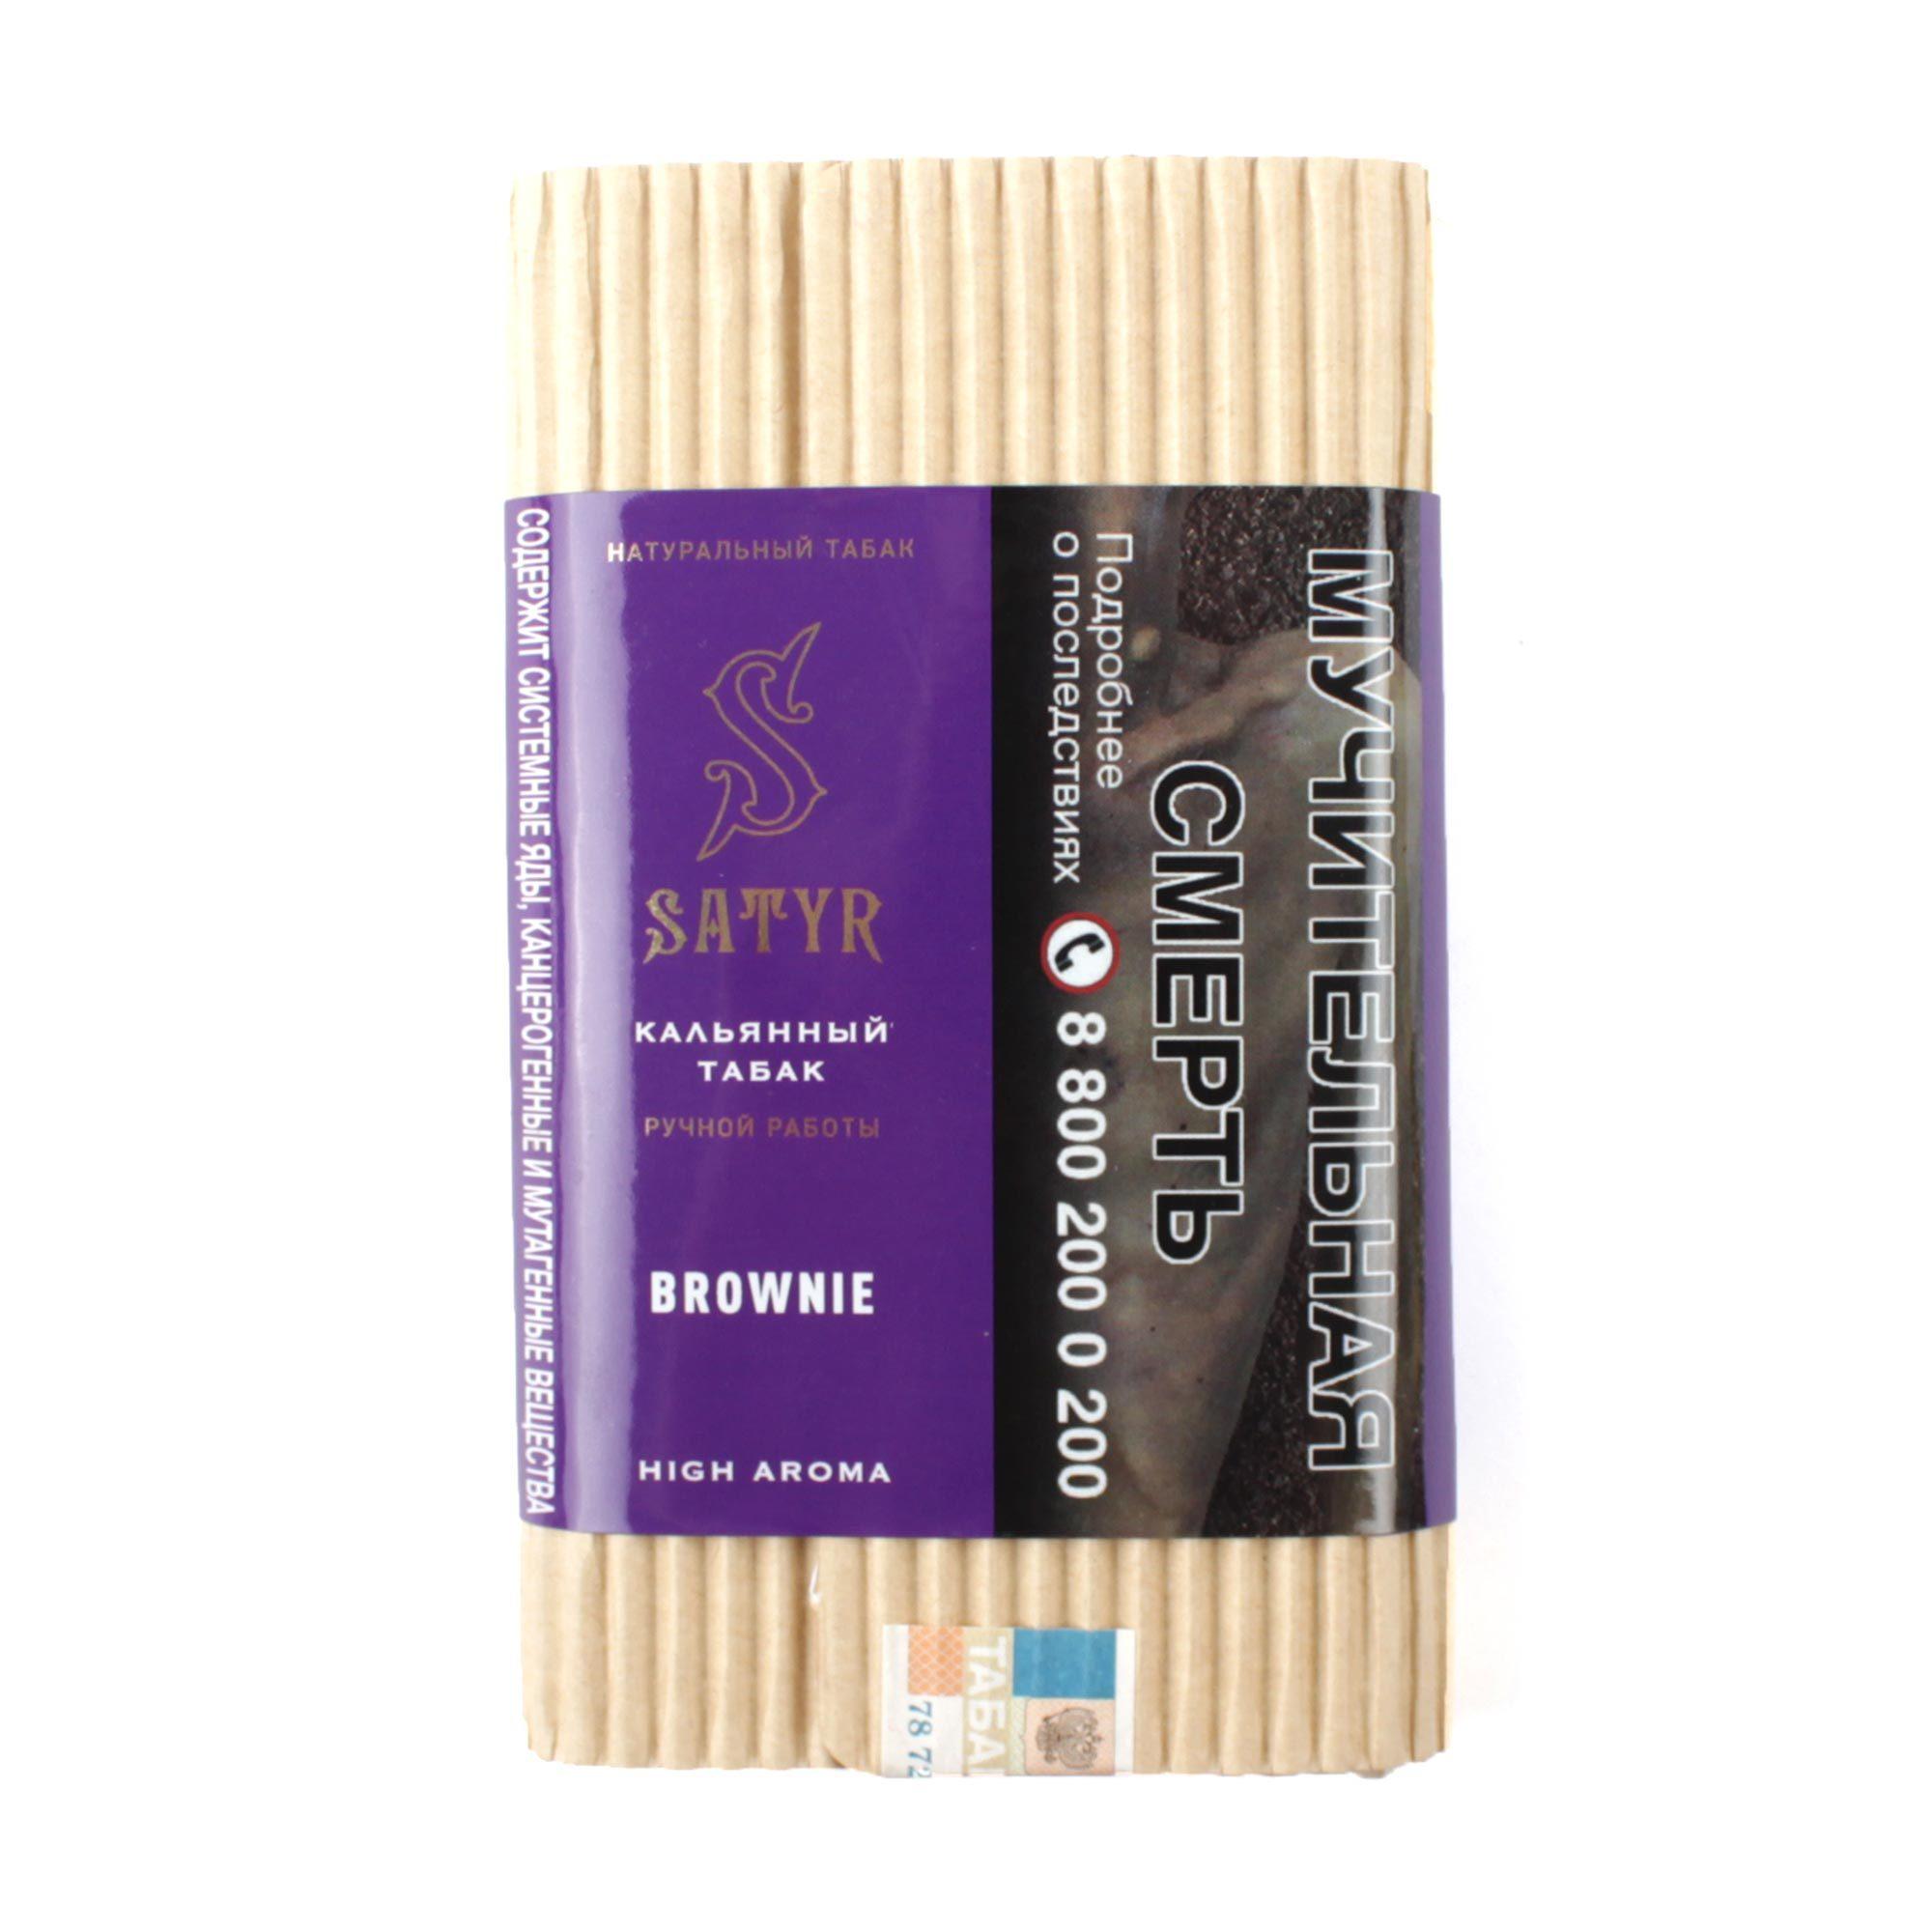 Табак для кальяна Satyr High Aroma 100 гр Brownie